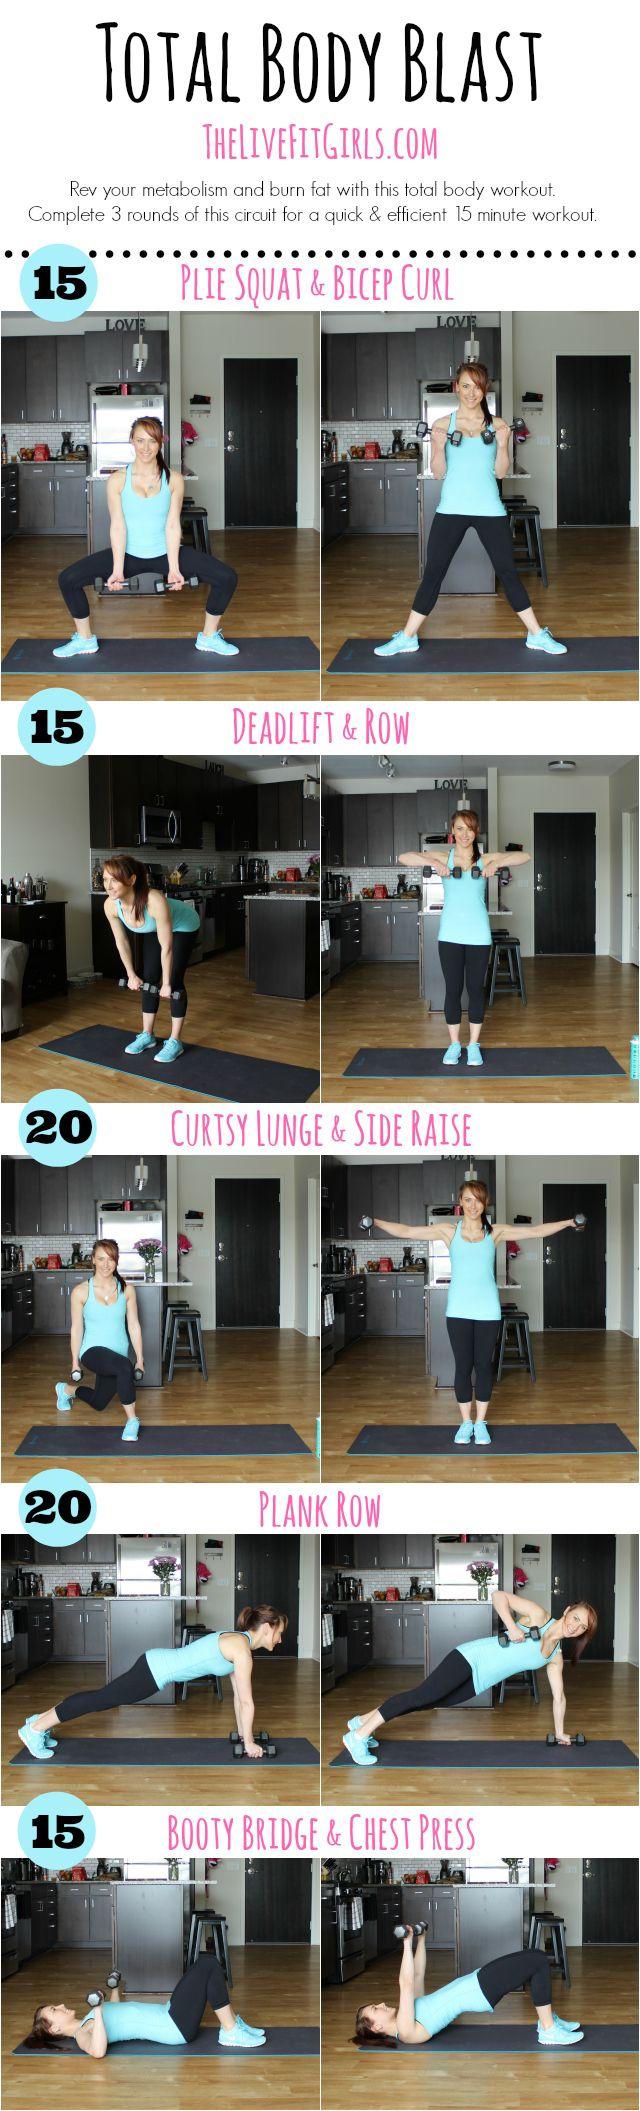 Total Body Blast Workout!